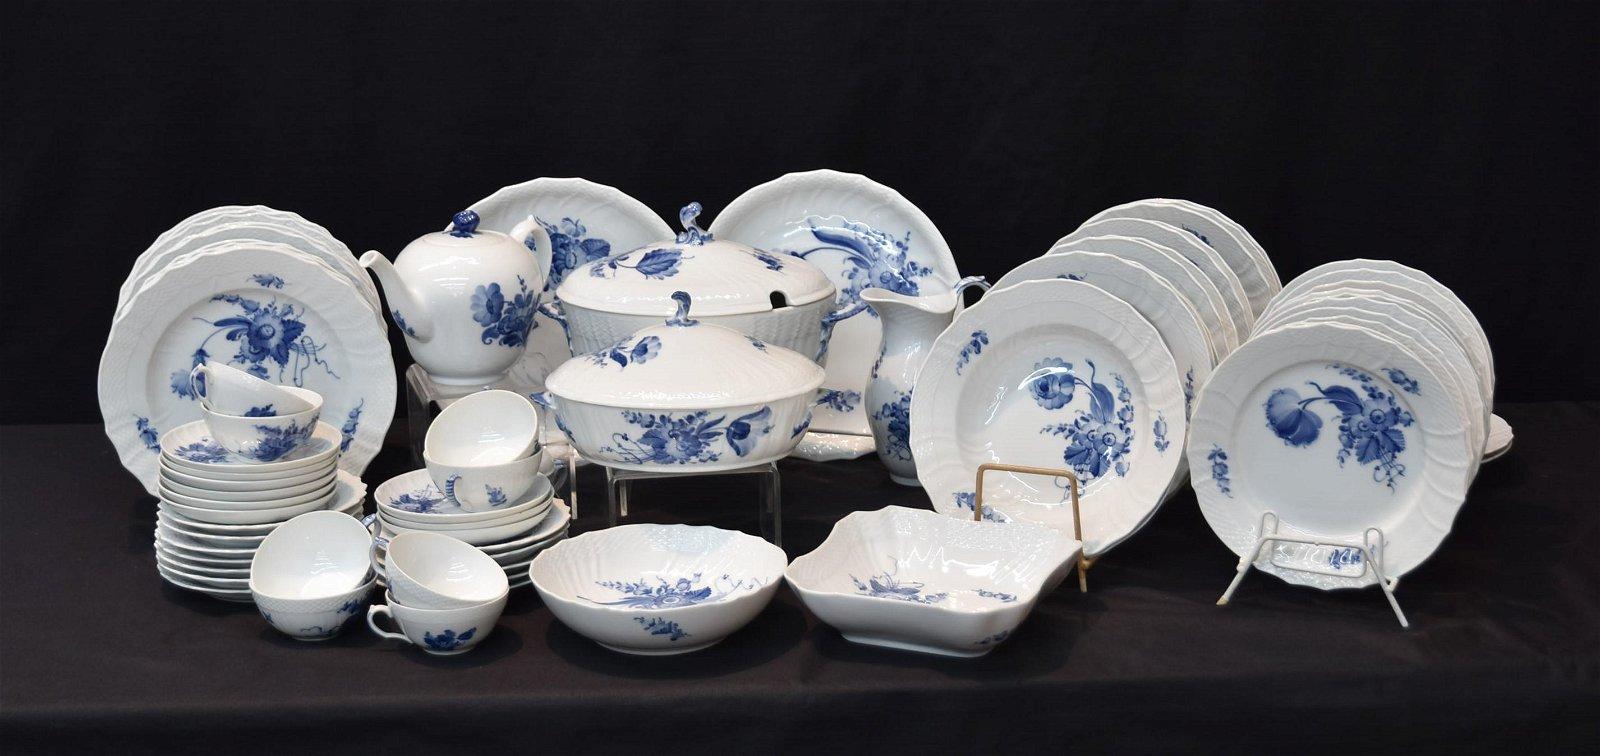 ROYAL COPENHAGEN BLUE FLOWERS DINNER SERVICE